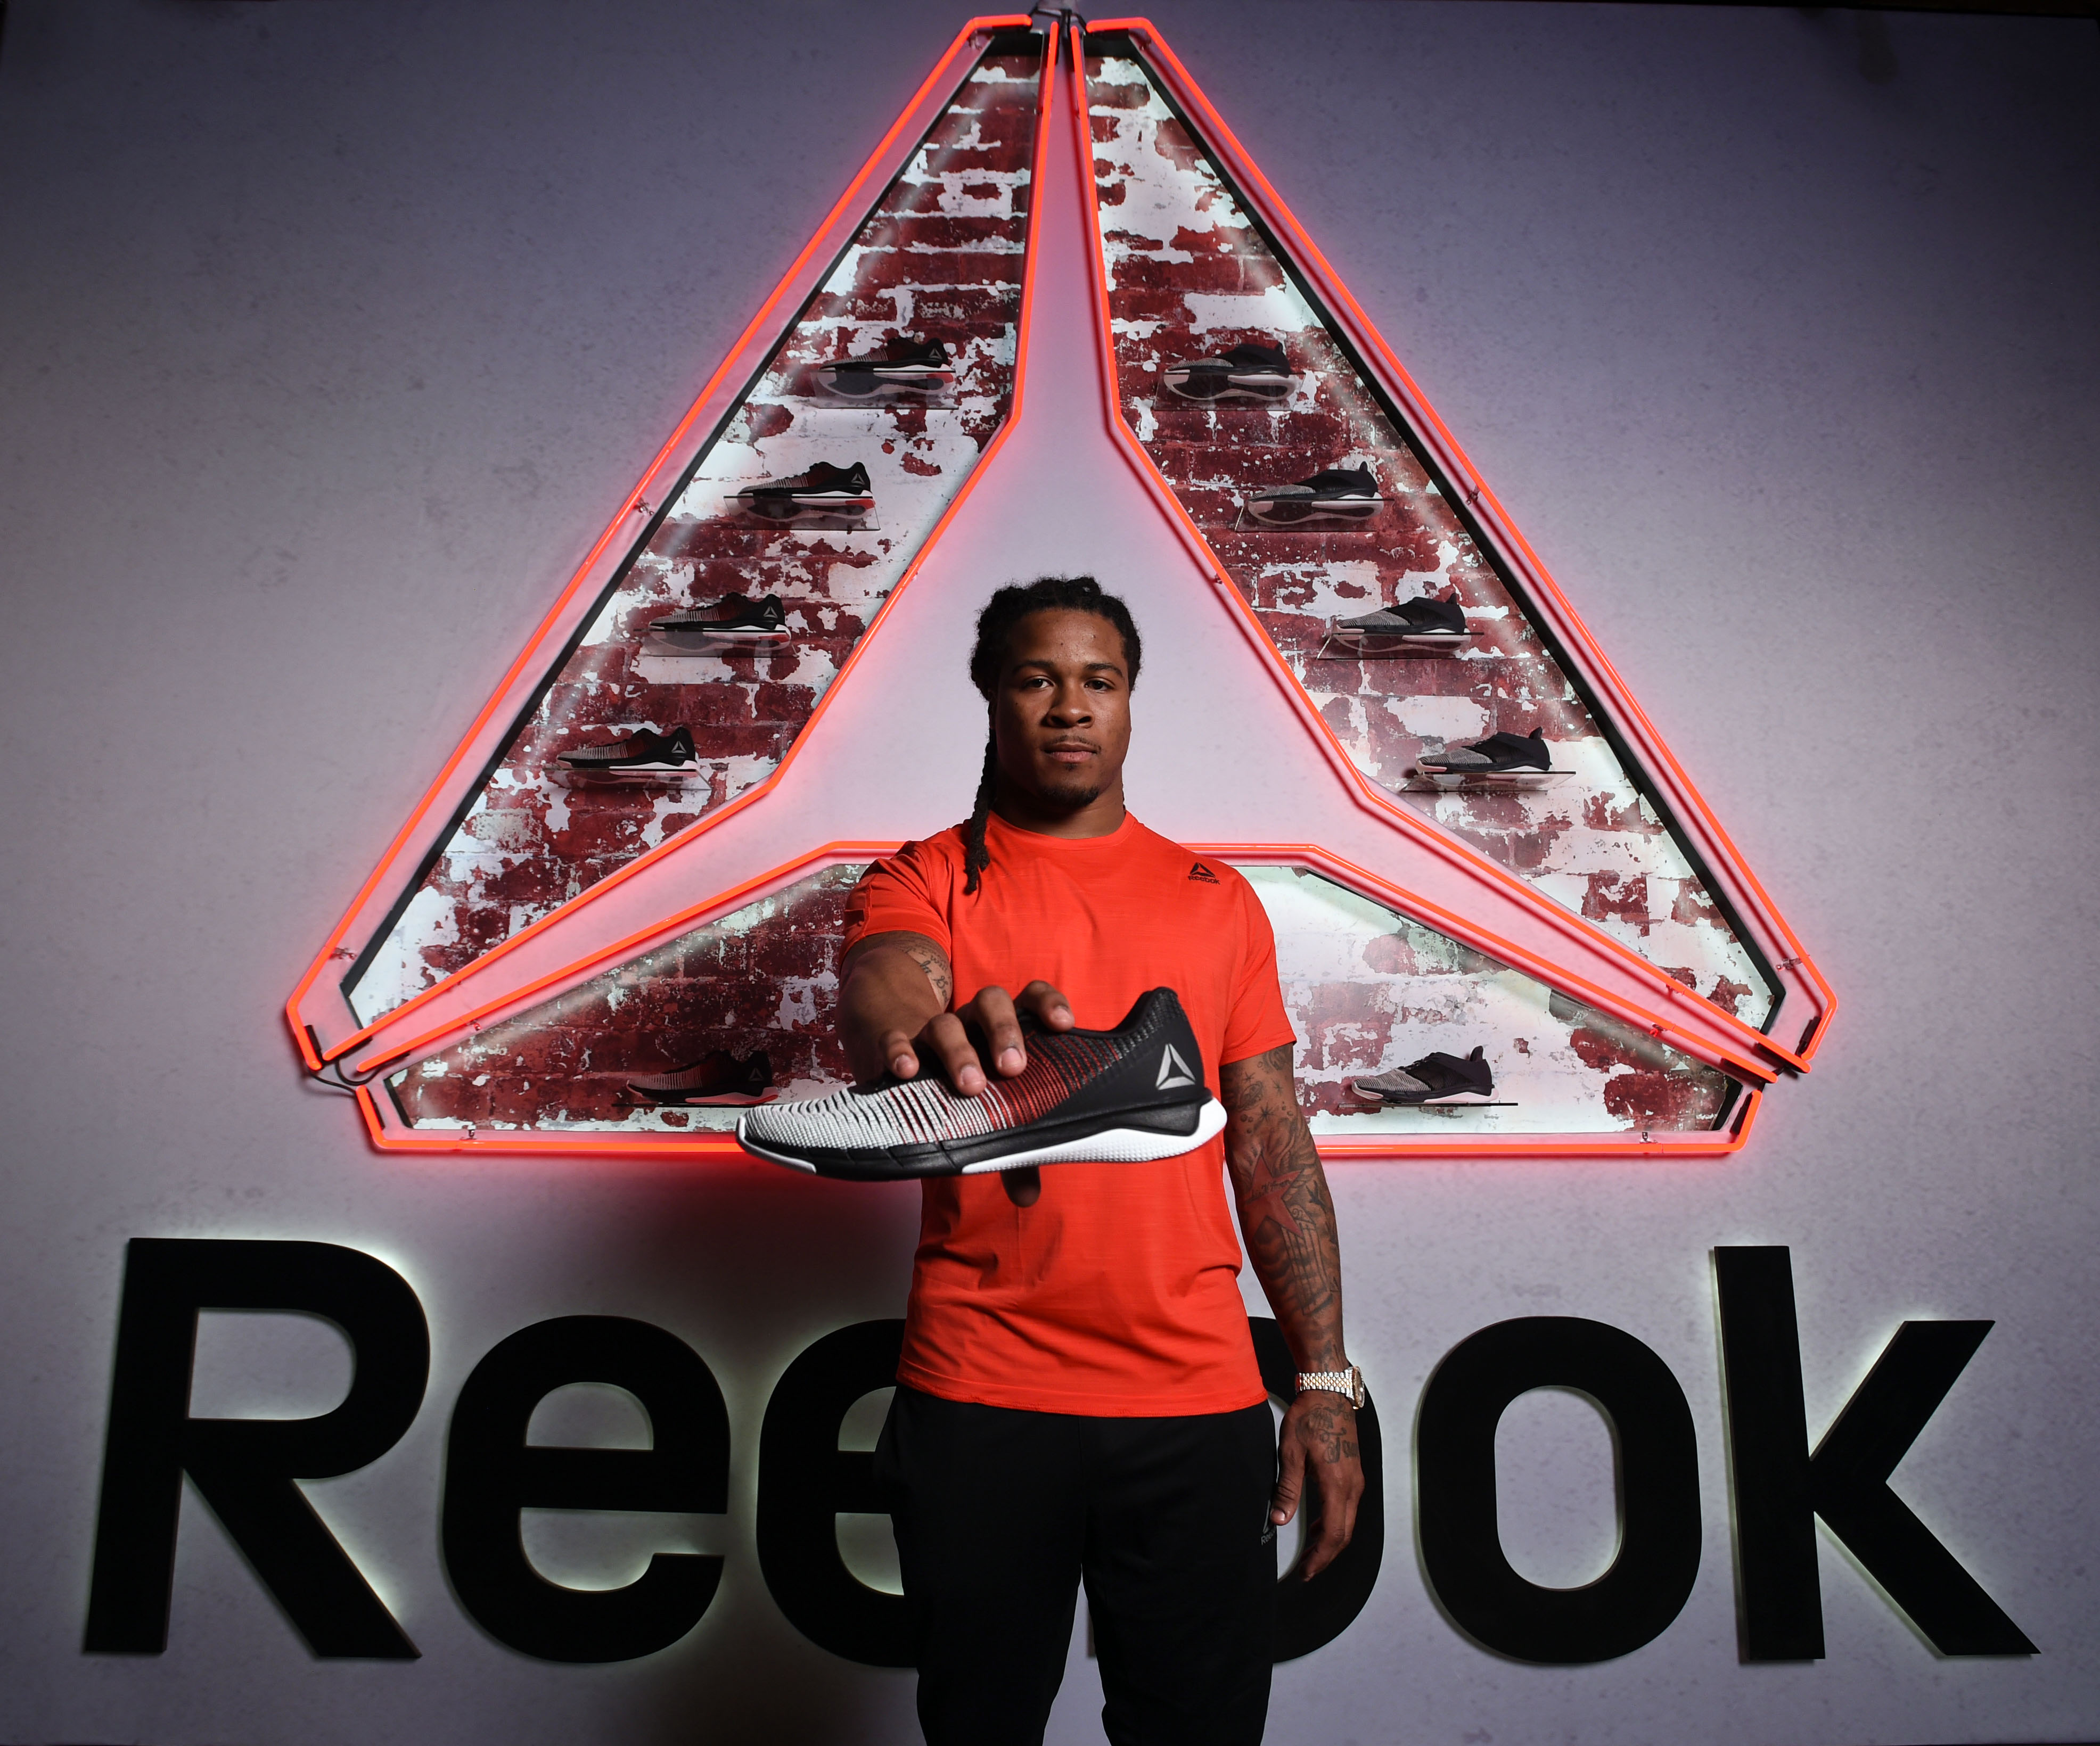 aa4a01d5645 Reebok launches new Fast Flexweave running shoe